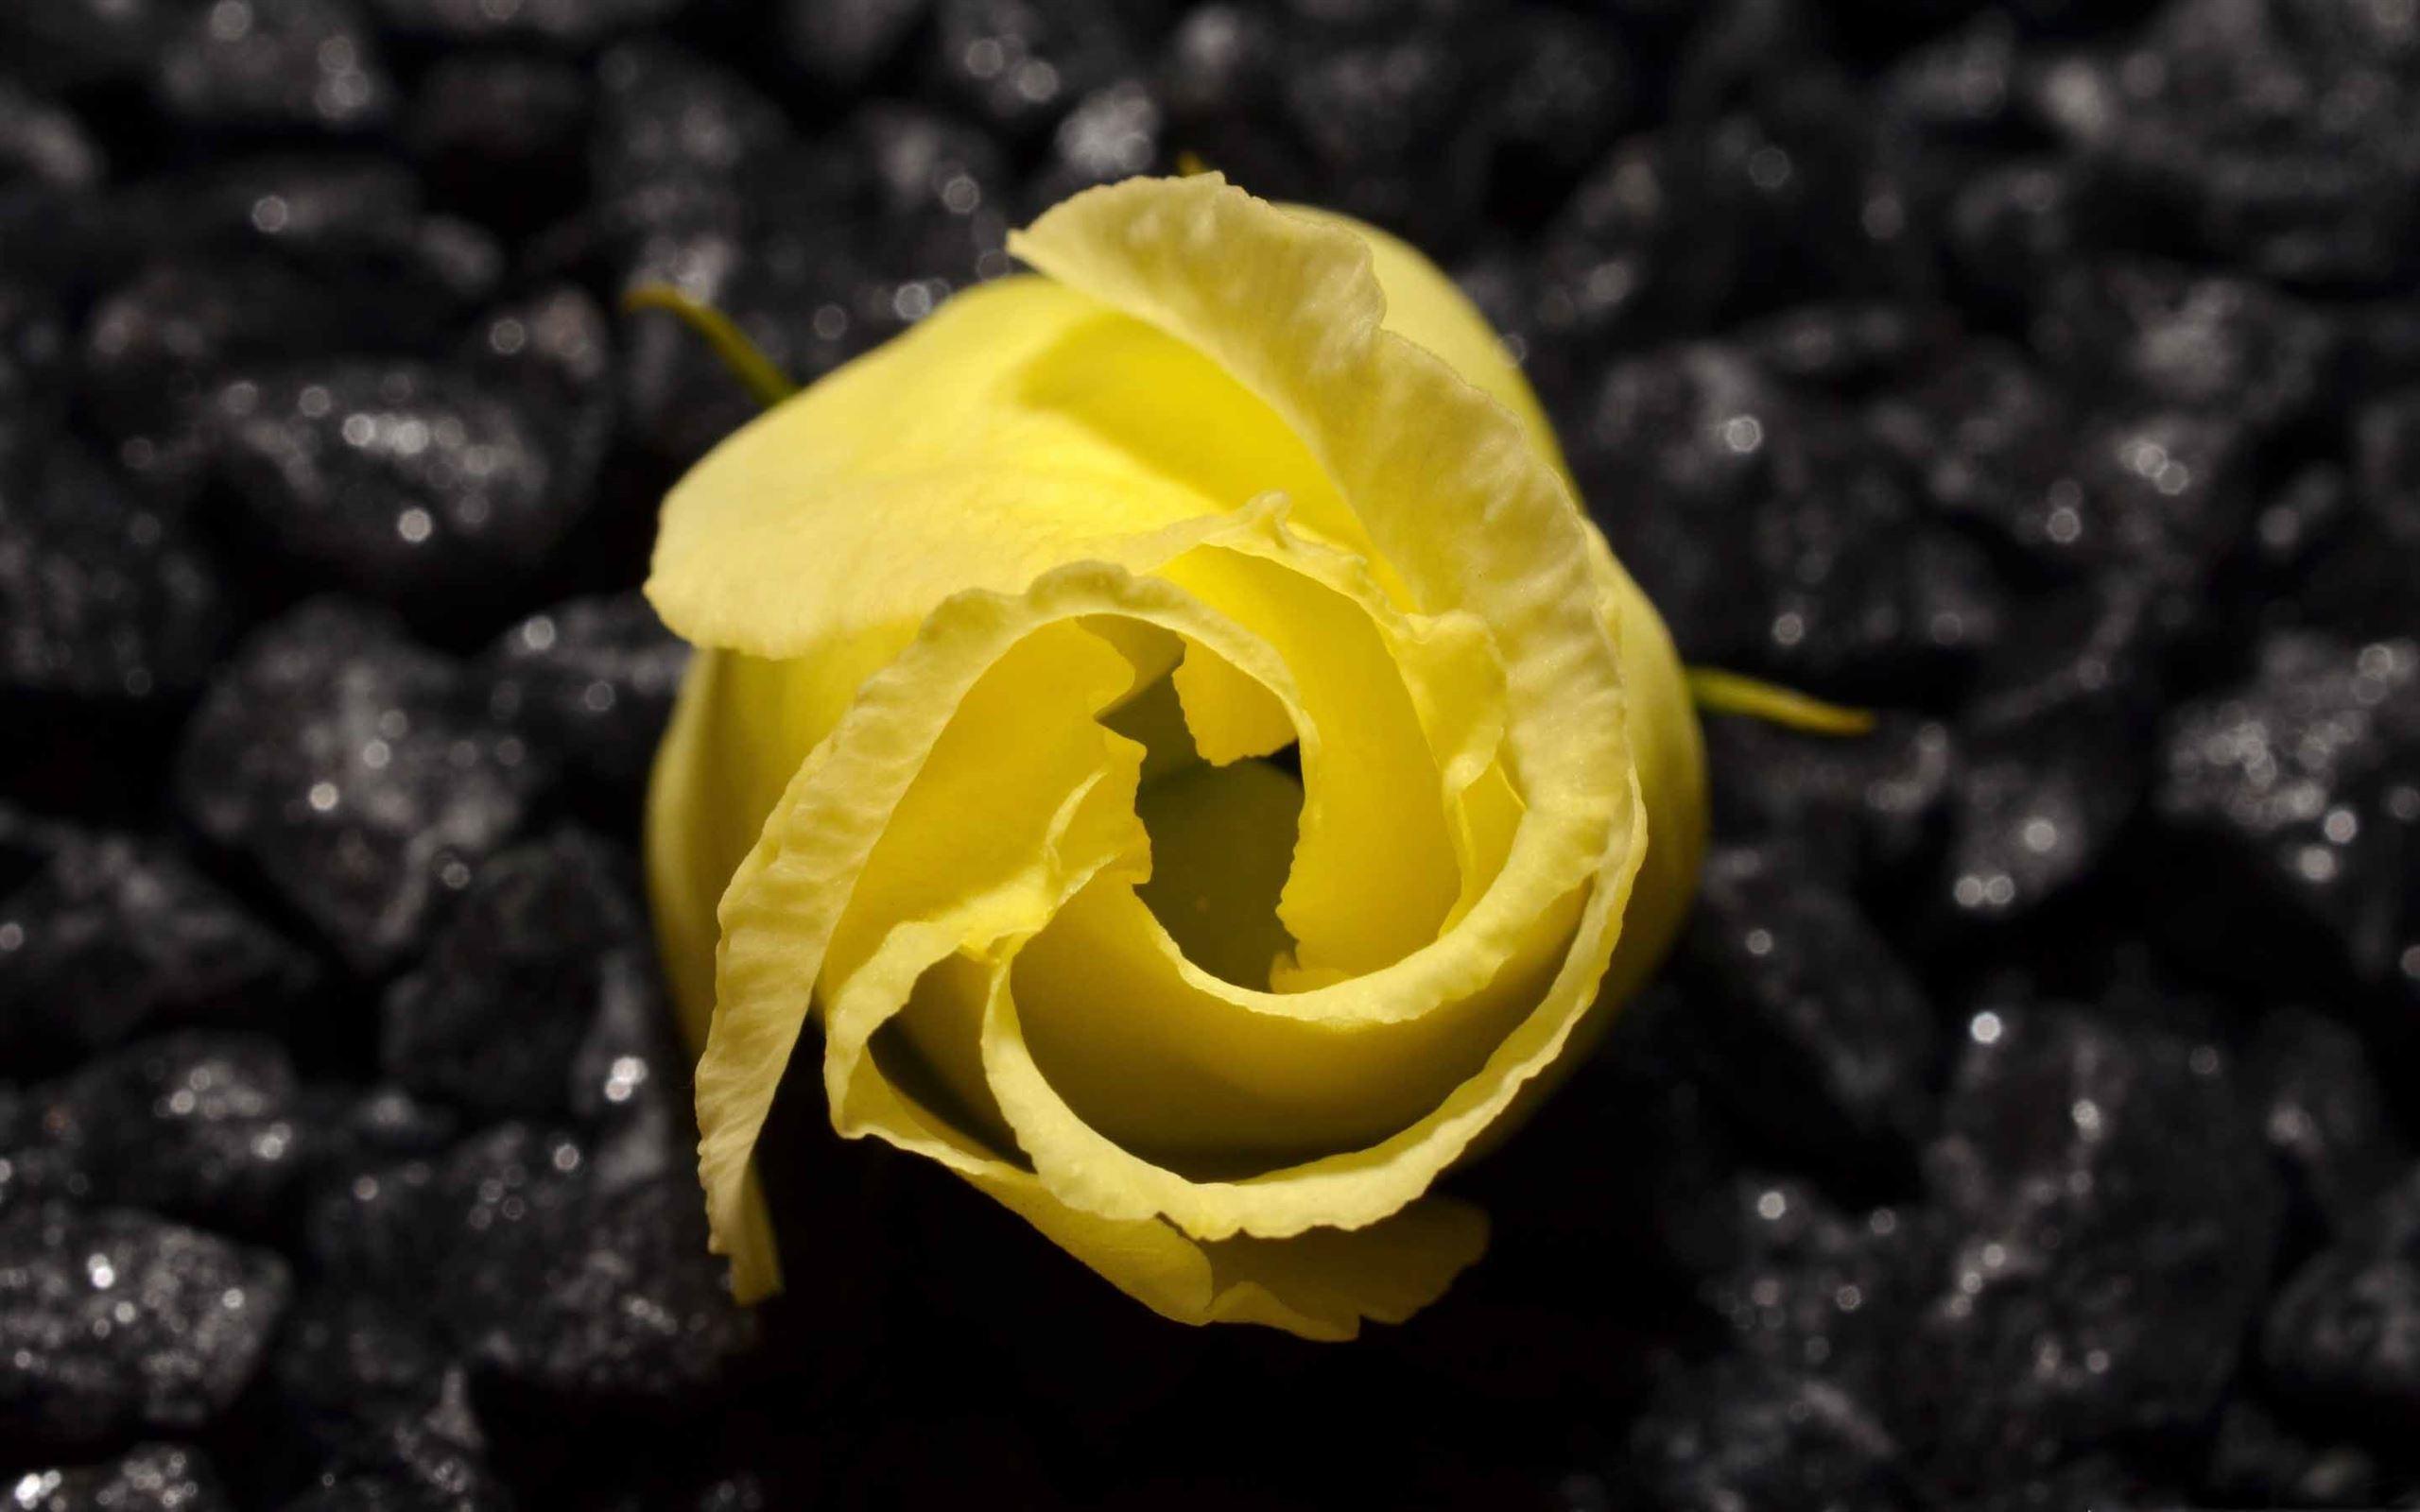 Yellow Flower Black Background Macbook Air Wallpaper Download Allmacwallpaper